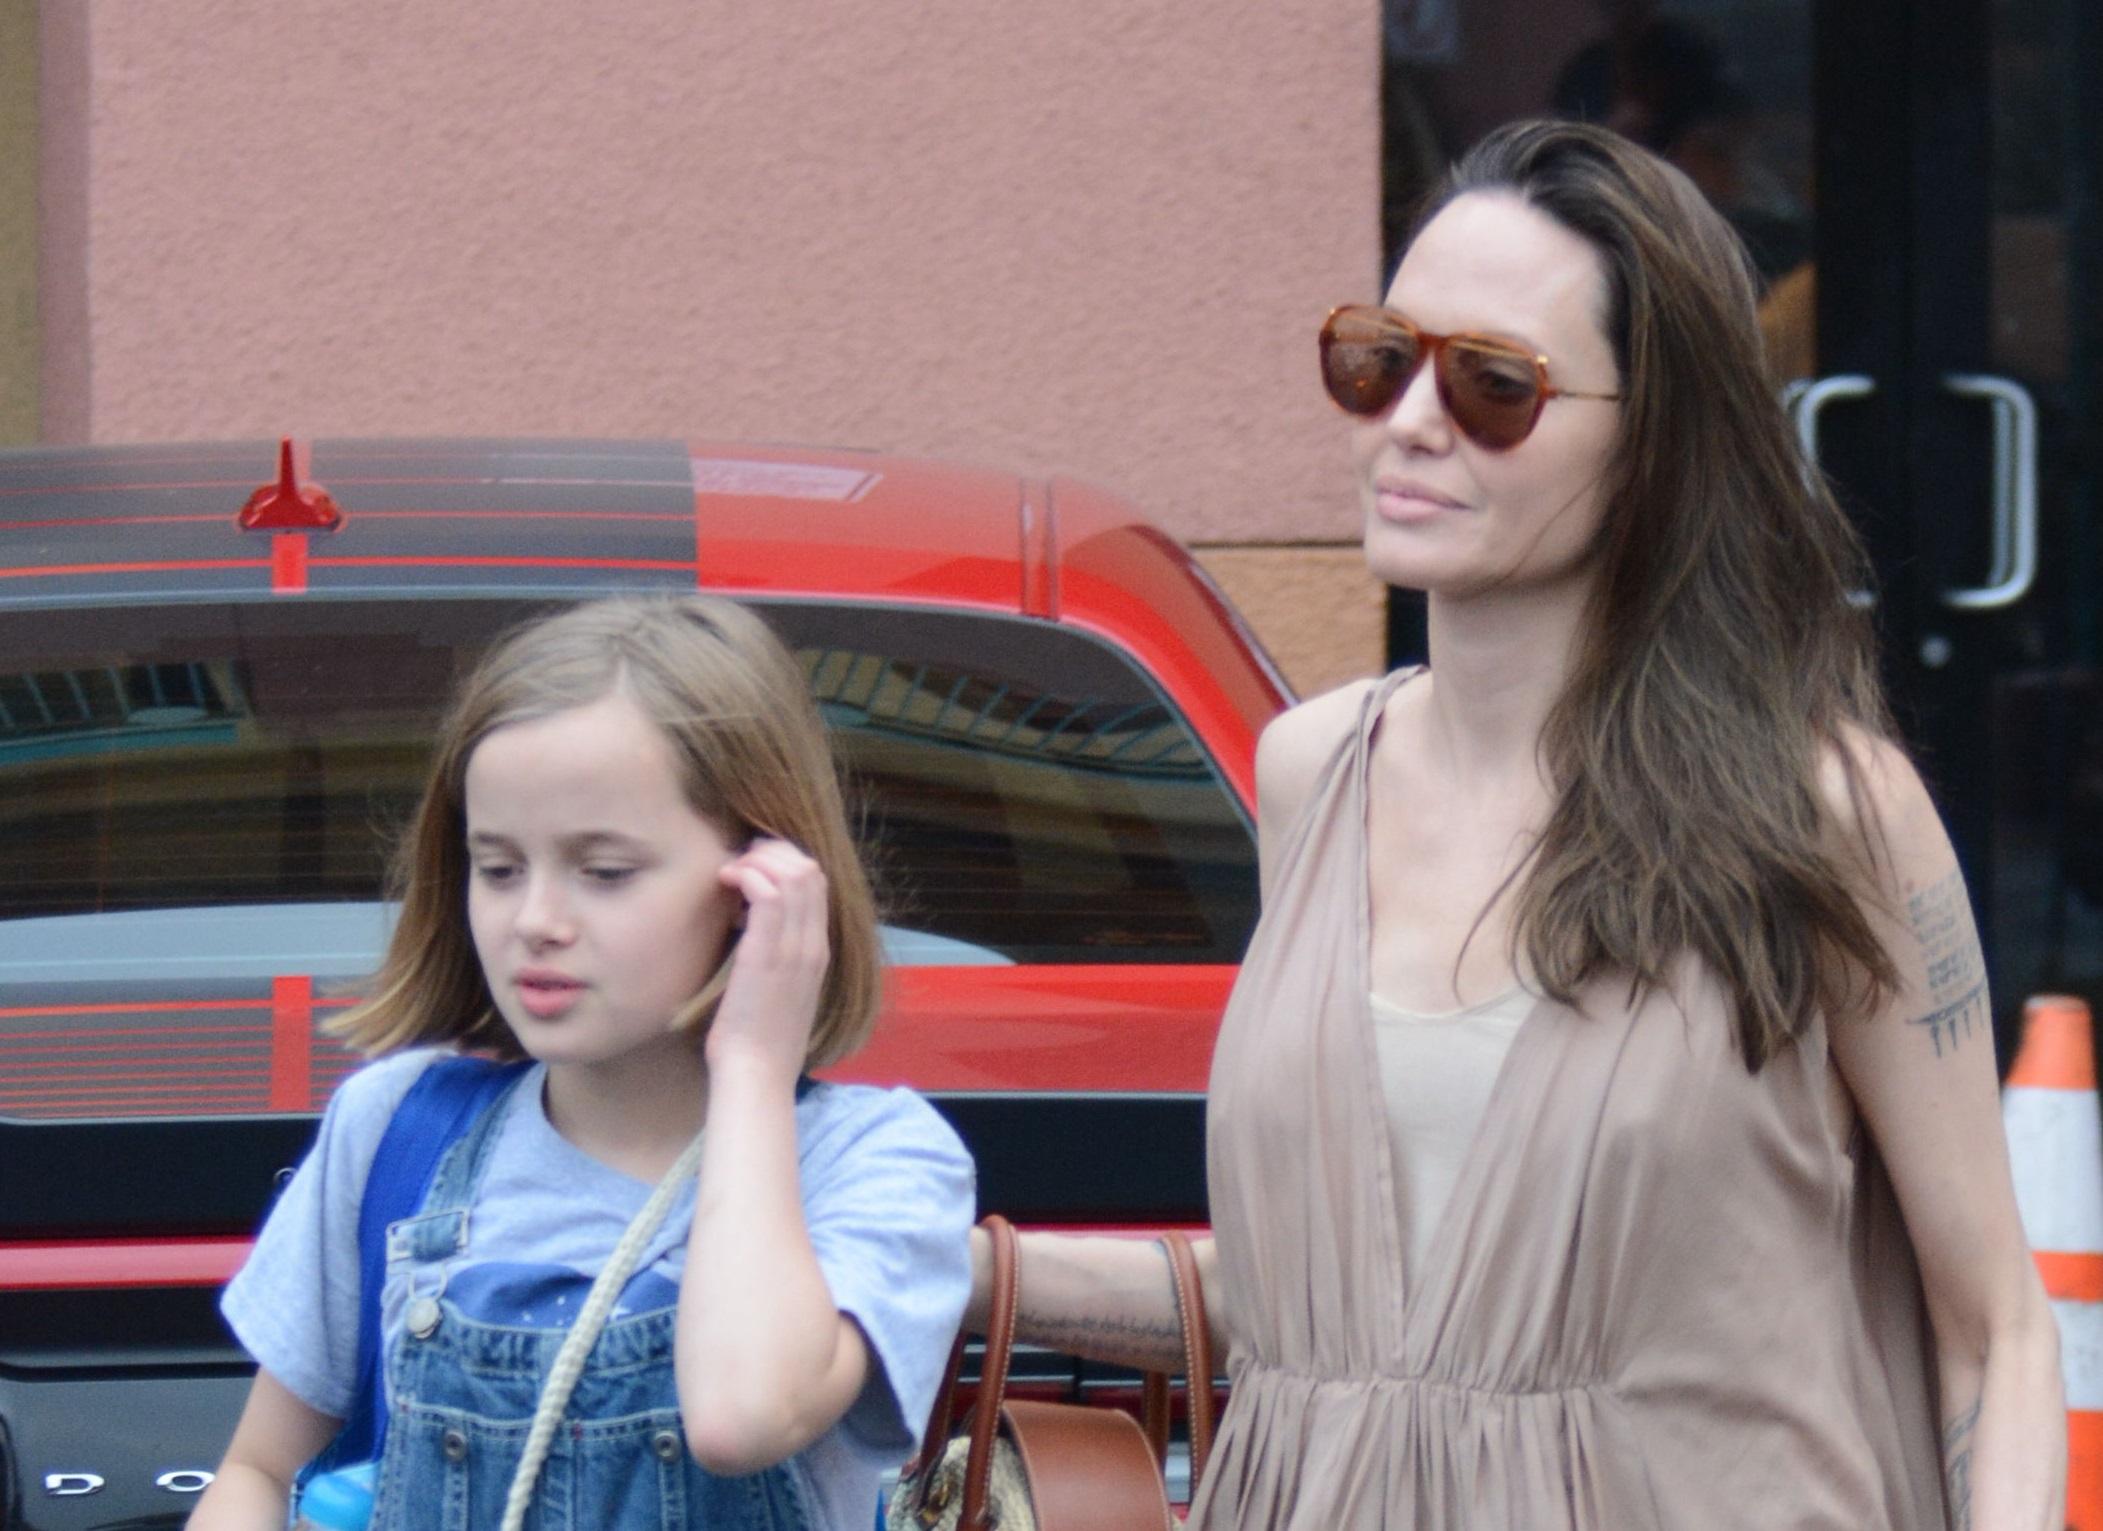 Angelina Jolie na zakupach z córką Vivienne (ZDJĘCIA)